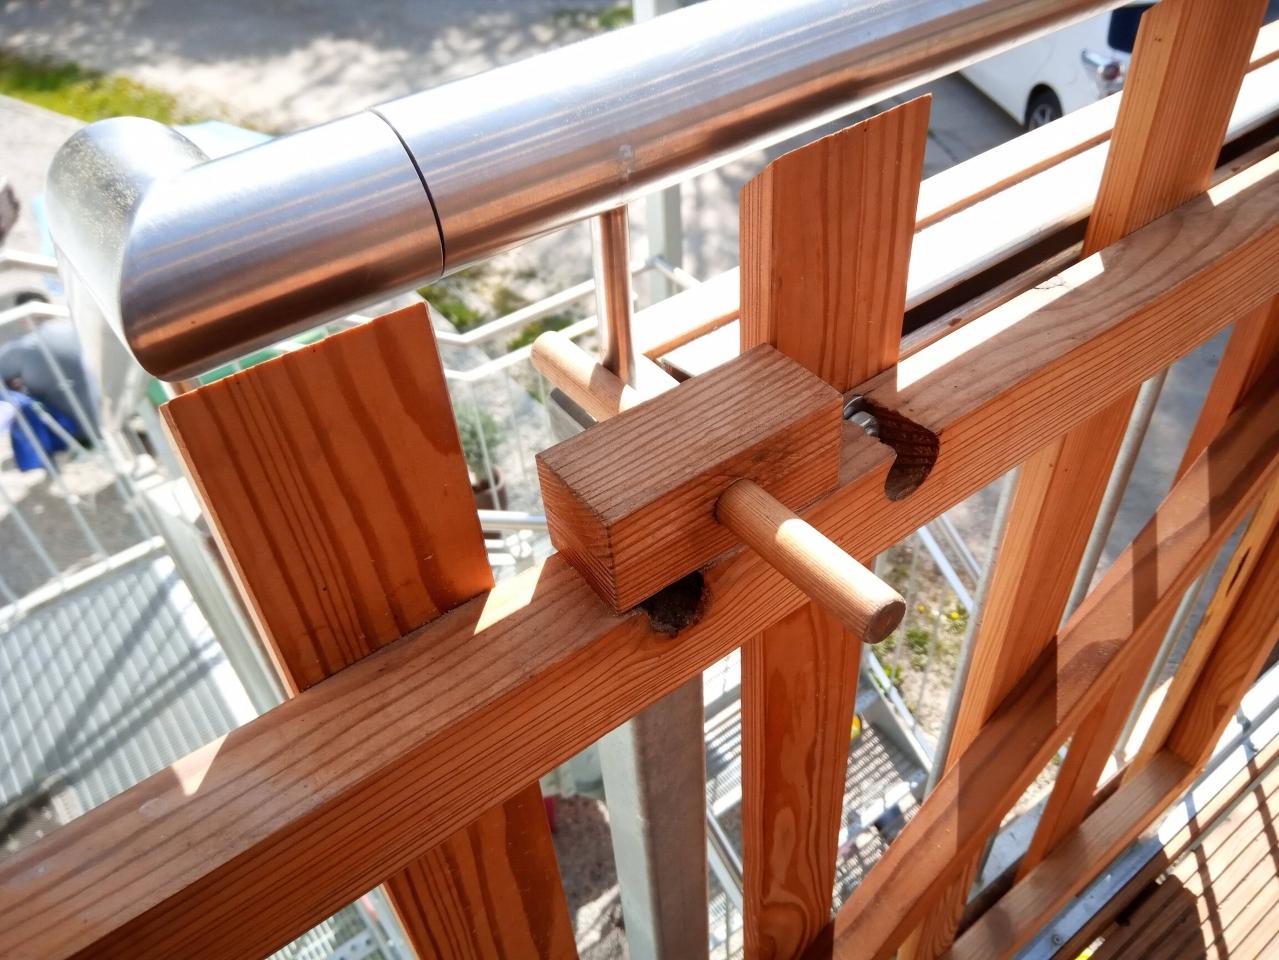 Schiebetor Fur Den Balkon Bauanleitung Zum Selberbauen 1 2 Do